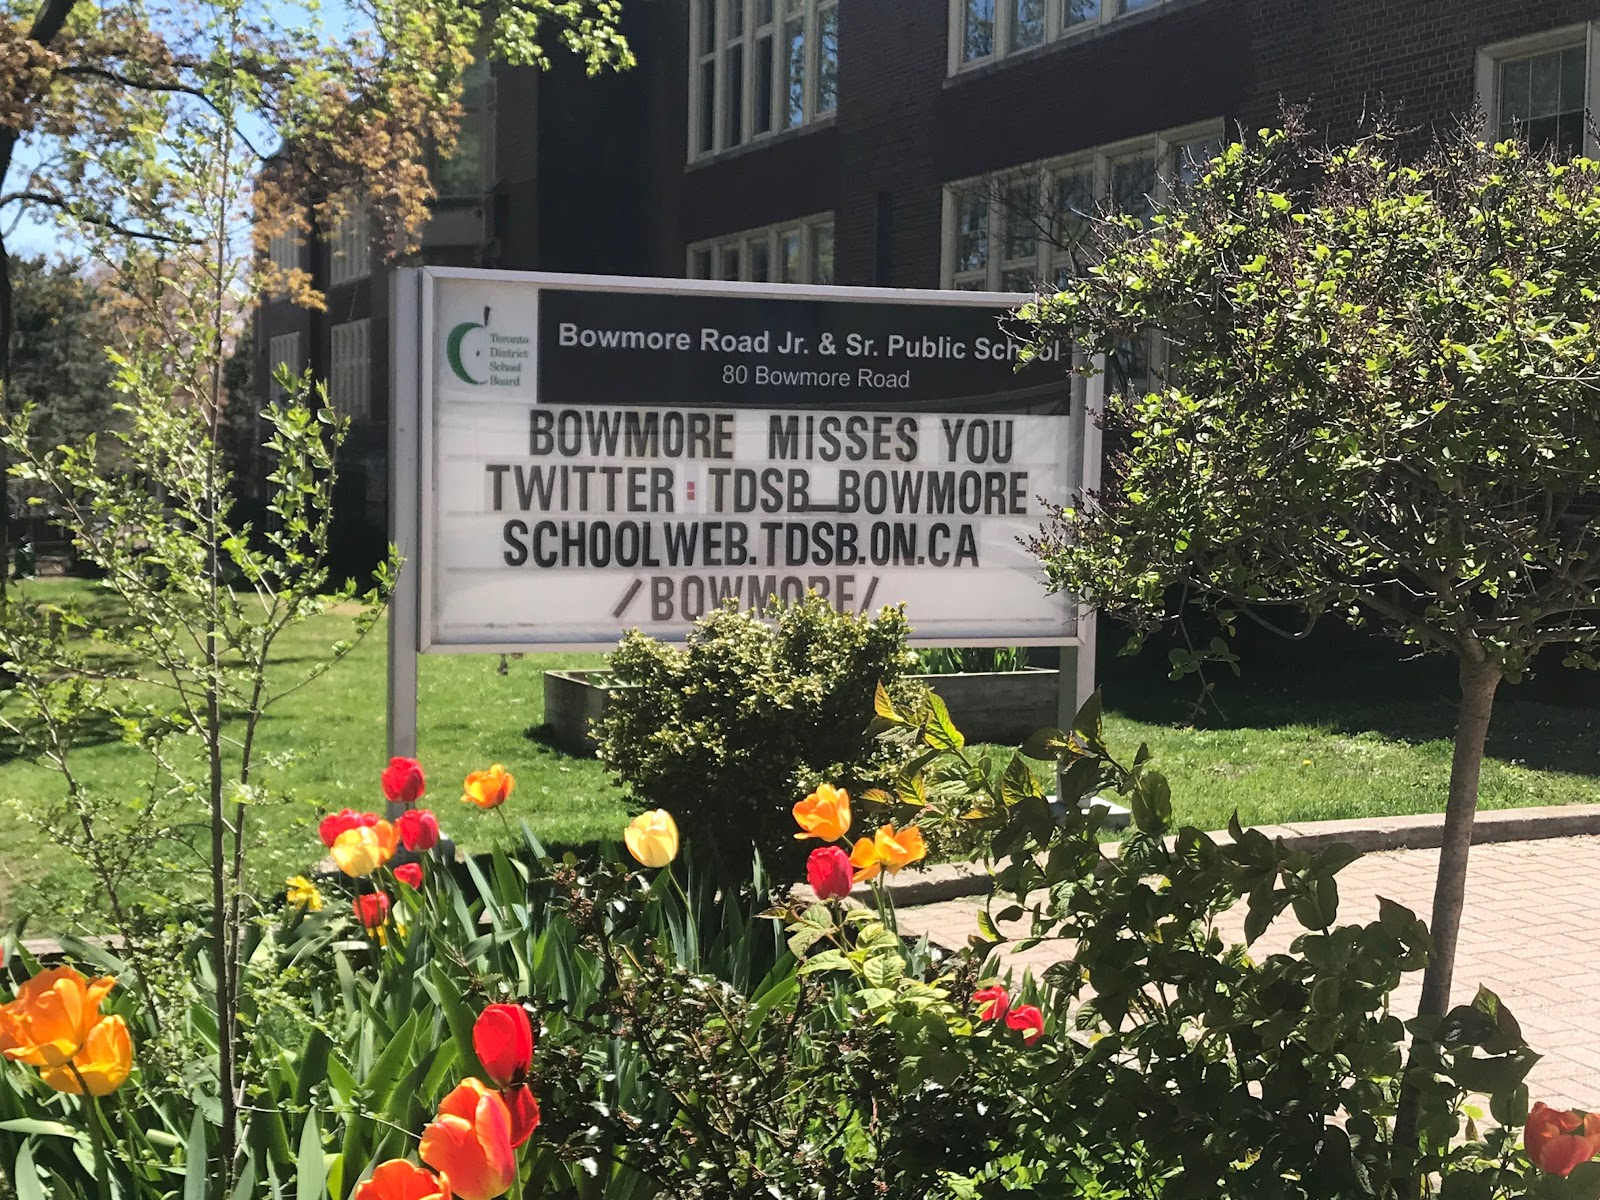 Bowmore School photo